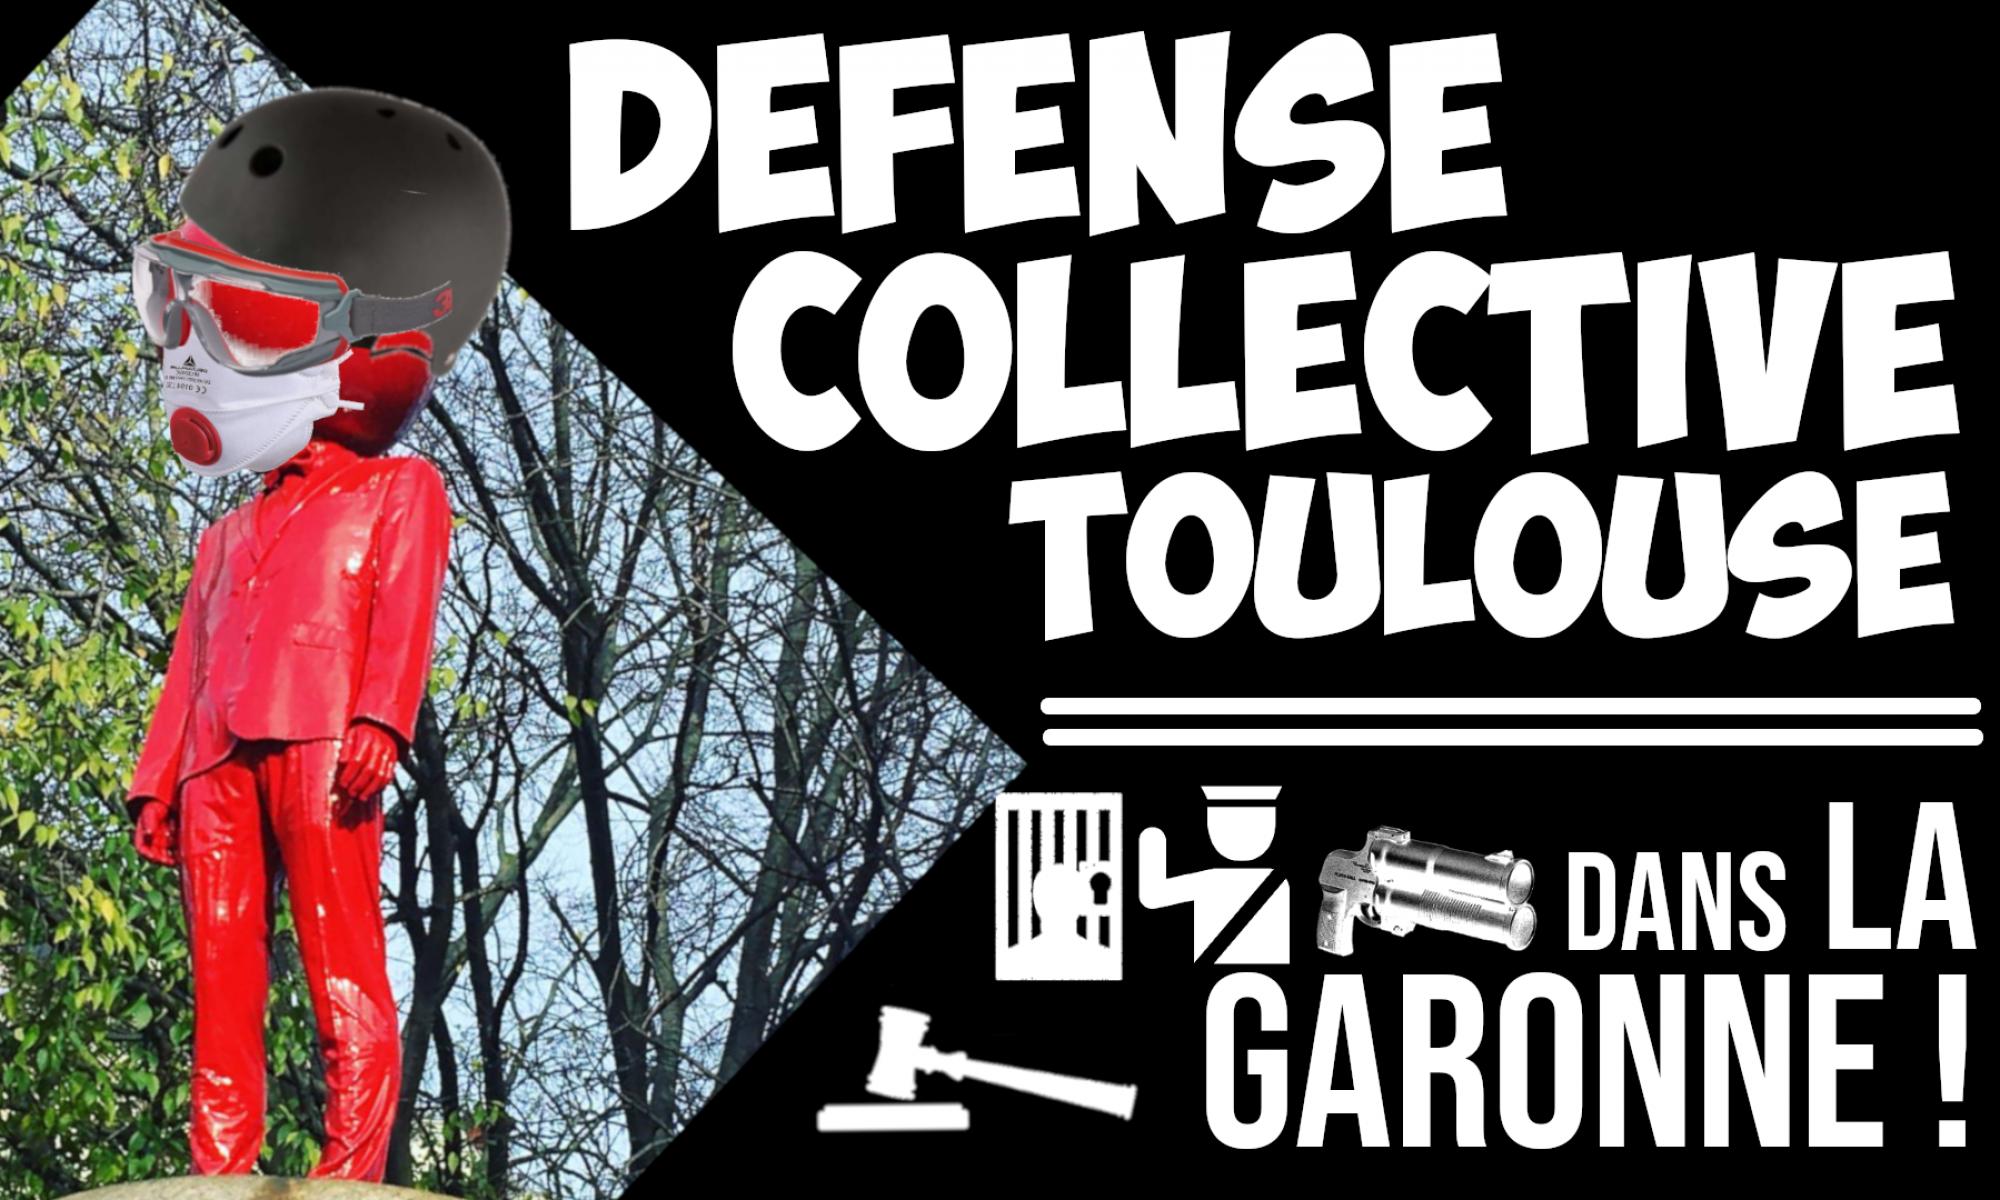 Défense Collective Toulouse